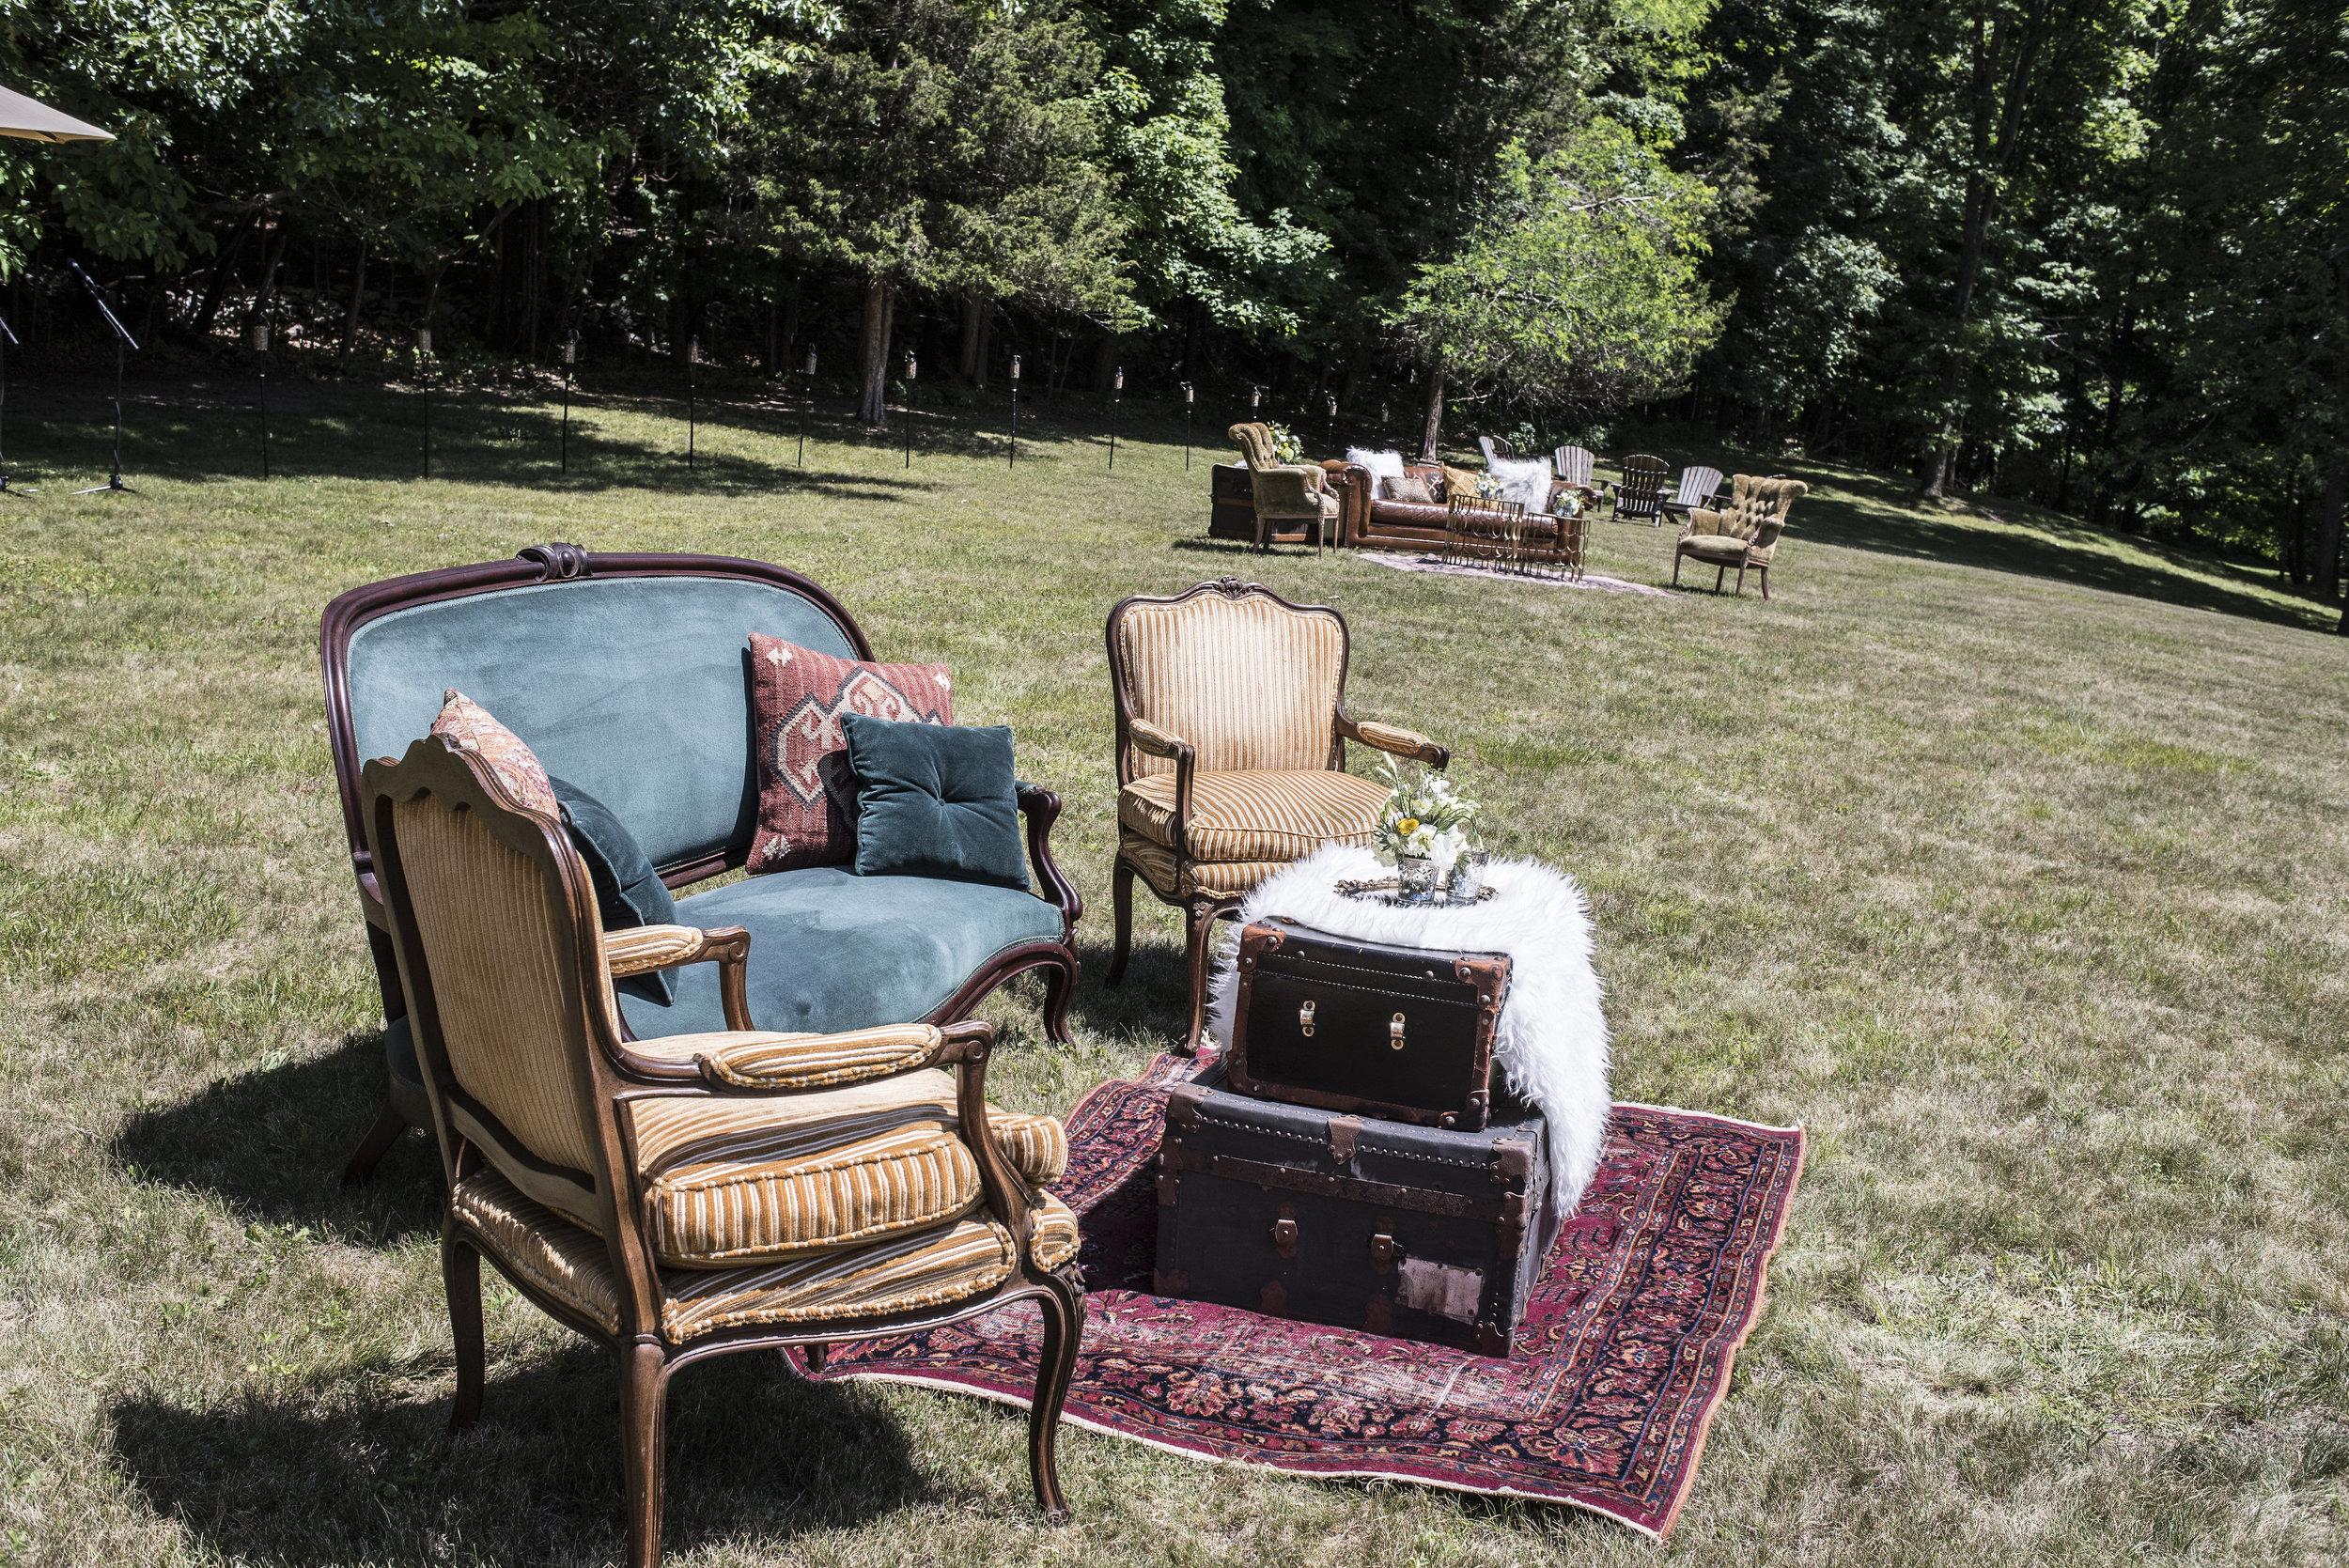 Andrea-Freeman-Events-Social-Event-Summer-Party-Rhinebeck-NY-4.JPG